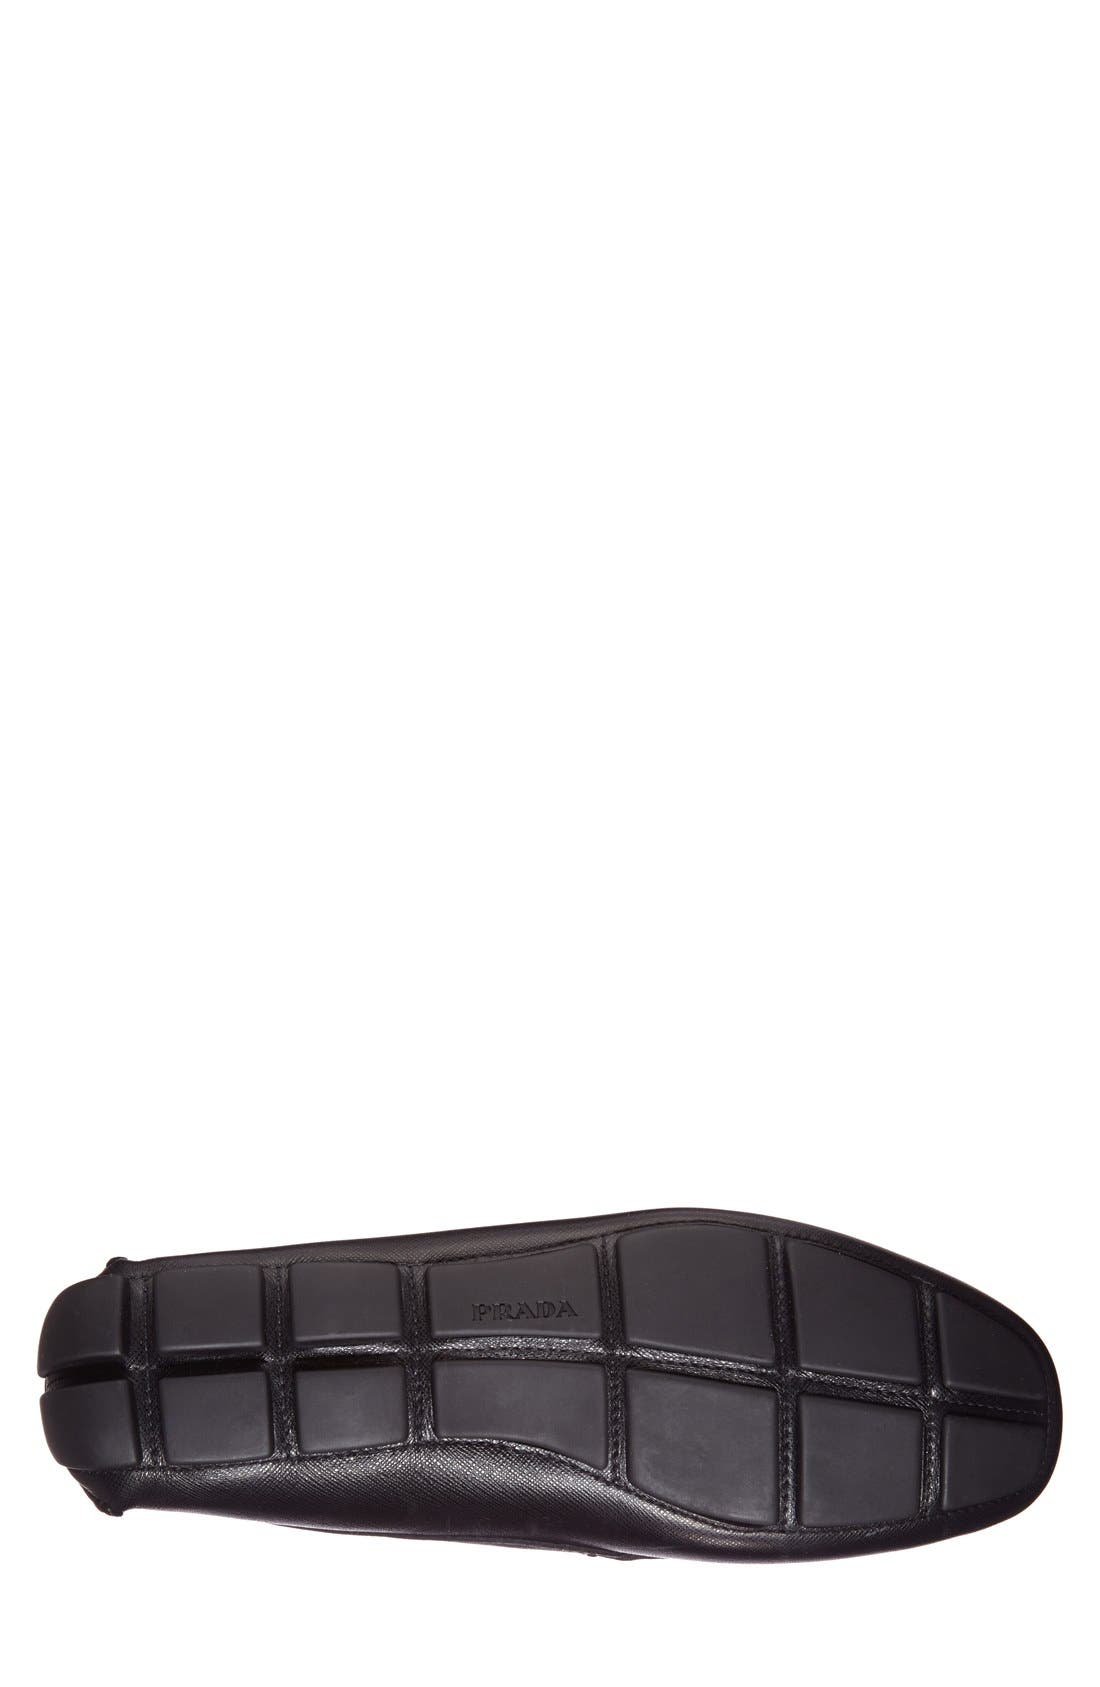 Alternate Image 4  - Prada Saffiano Leather Driving Shoe (Men)